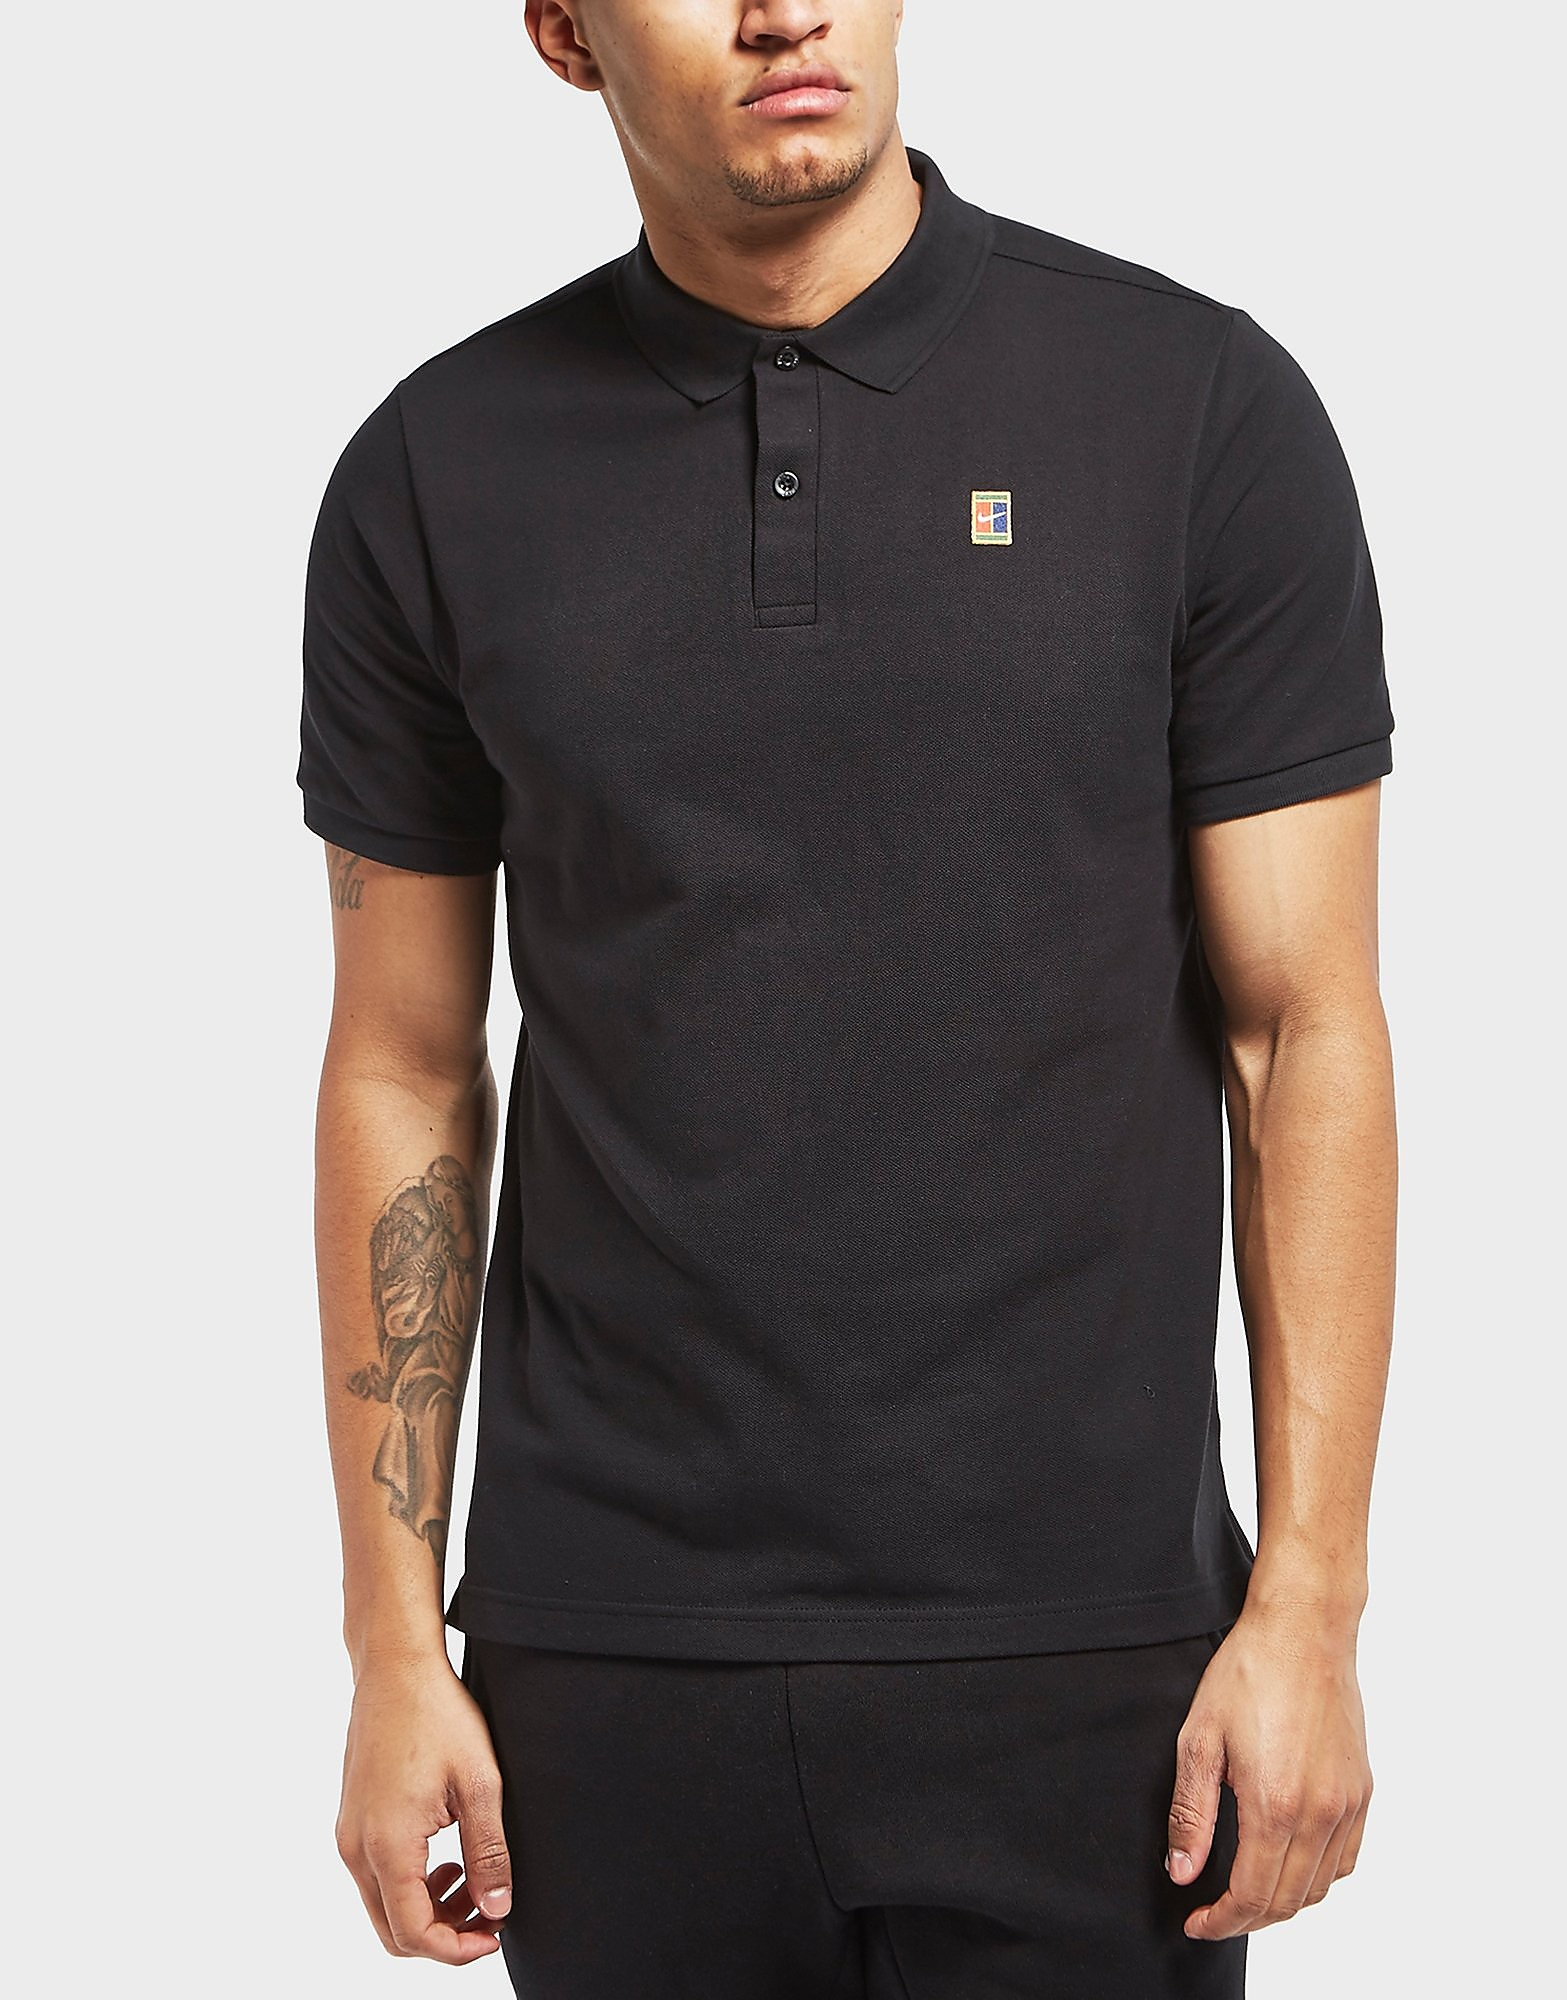 Nike Court Short Sleeve Polo Shirt